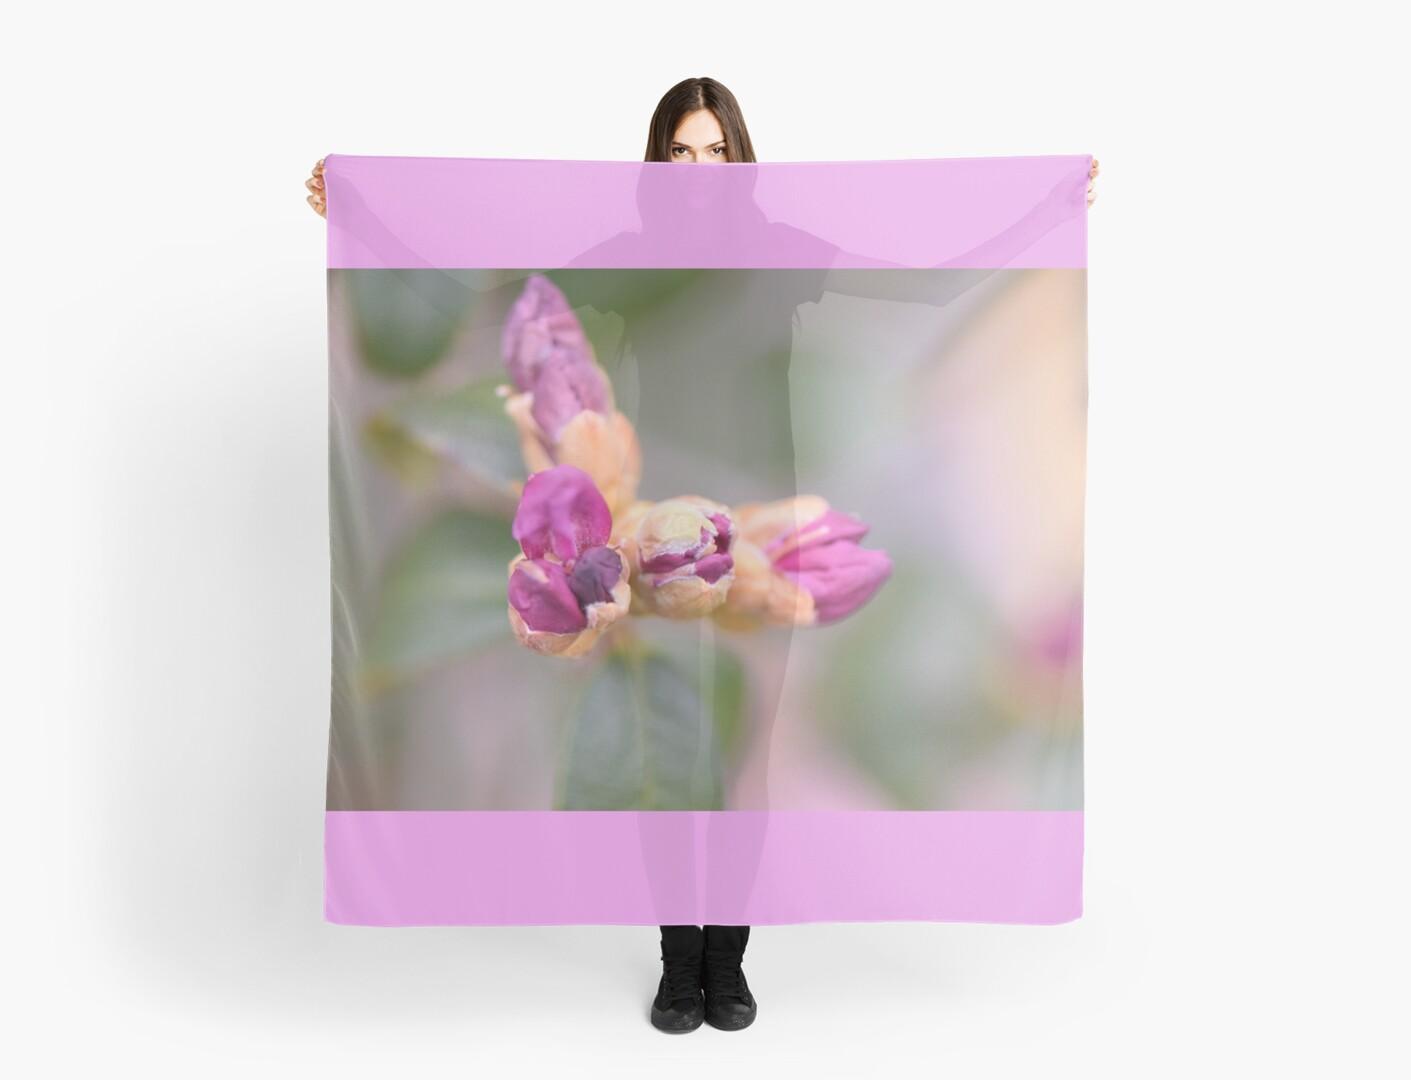 Flower Buds by Aylishliane